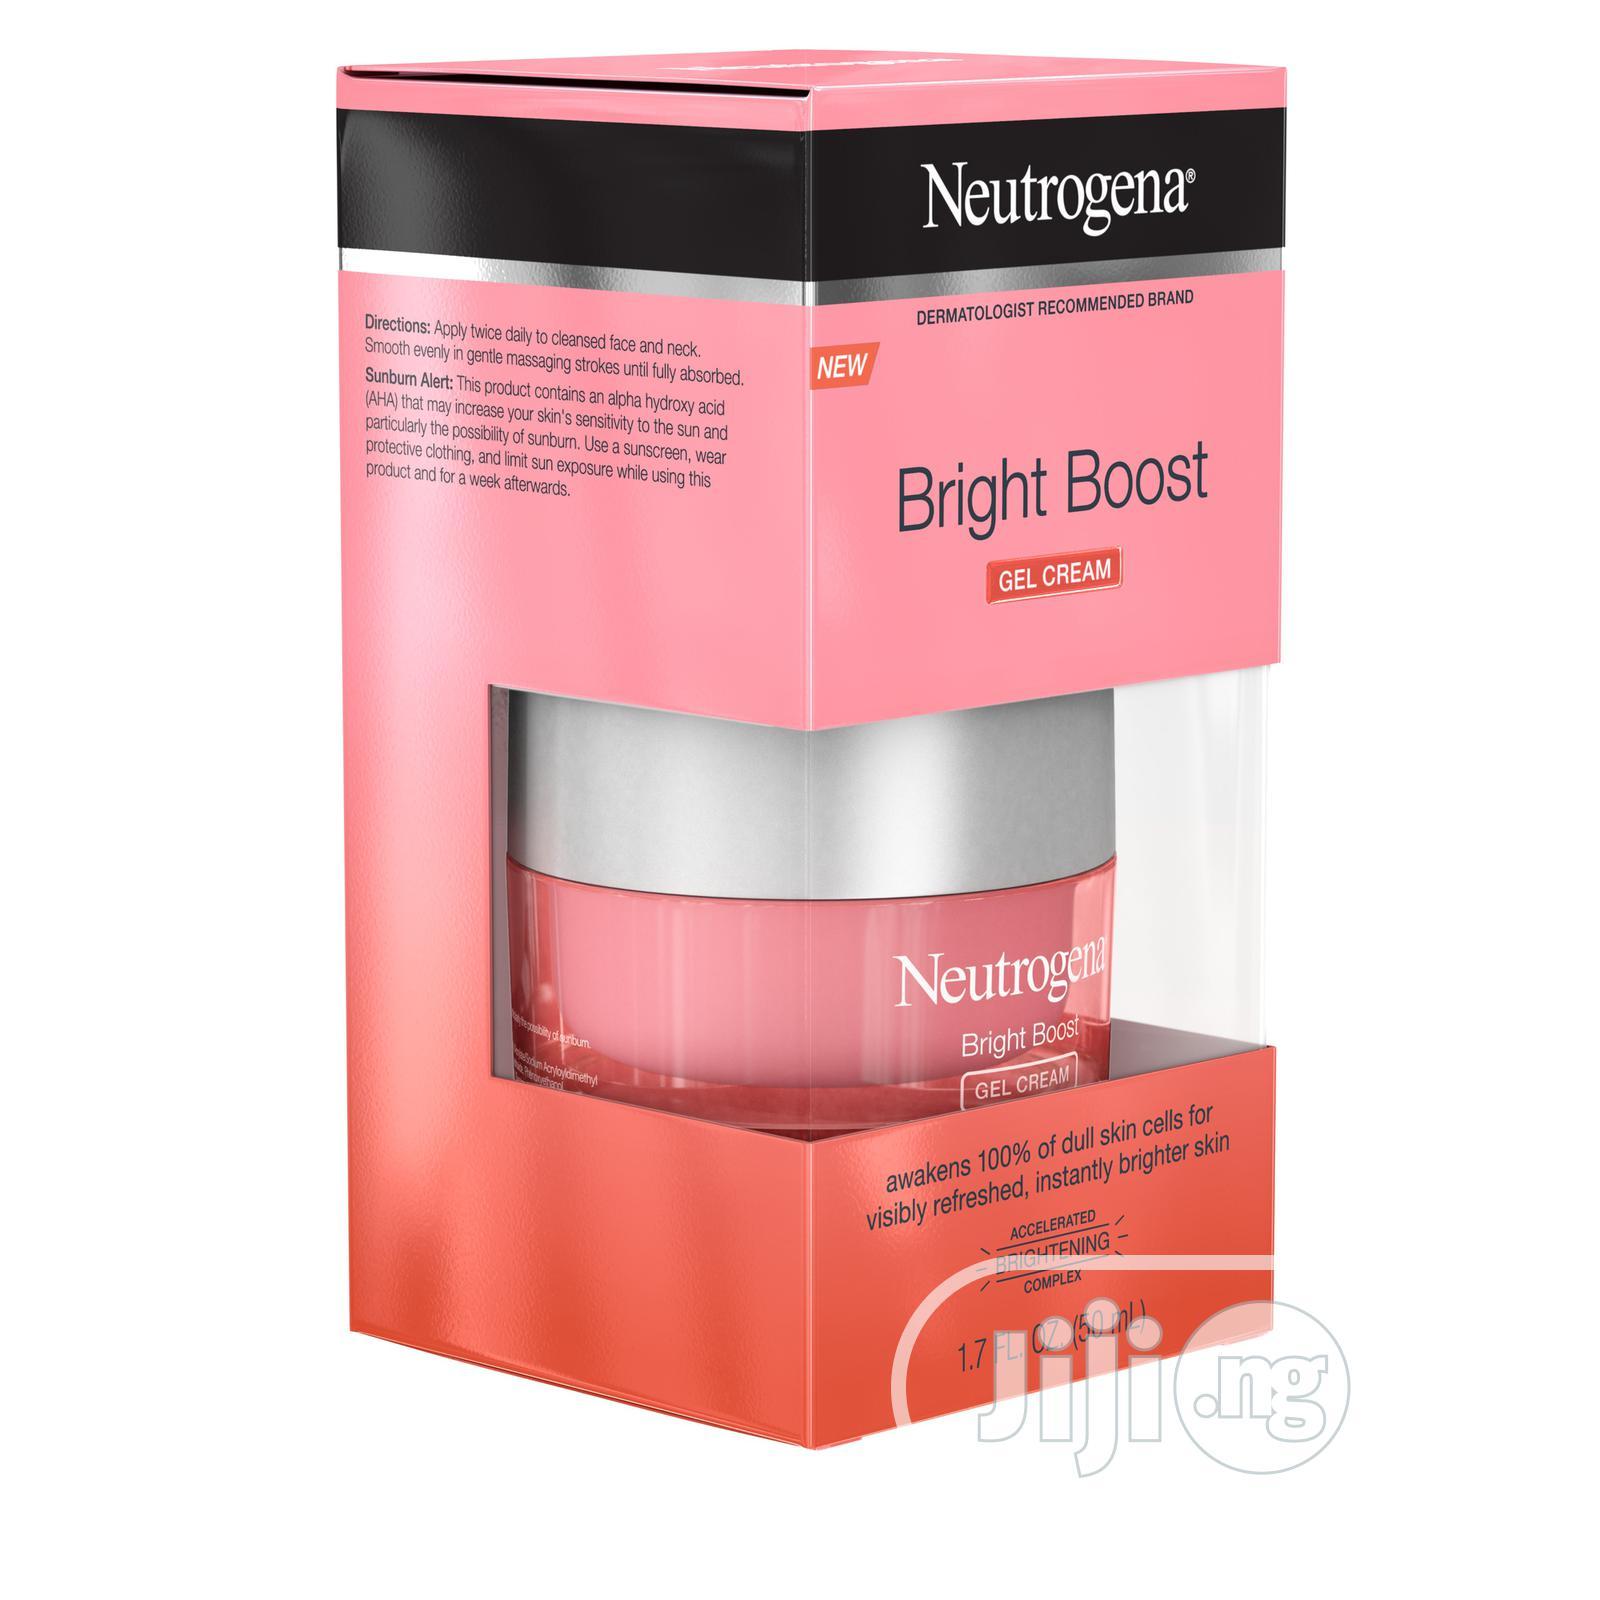 Neutrogena Bright Boost Gel Moisturizer